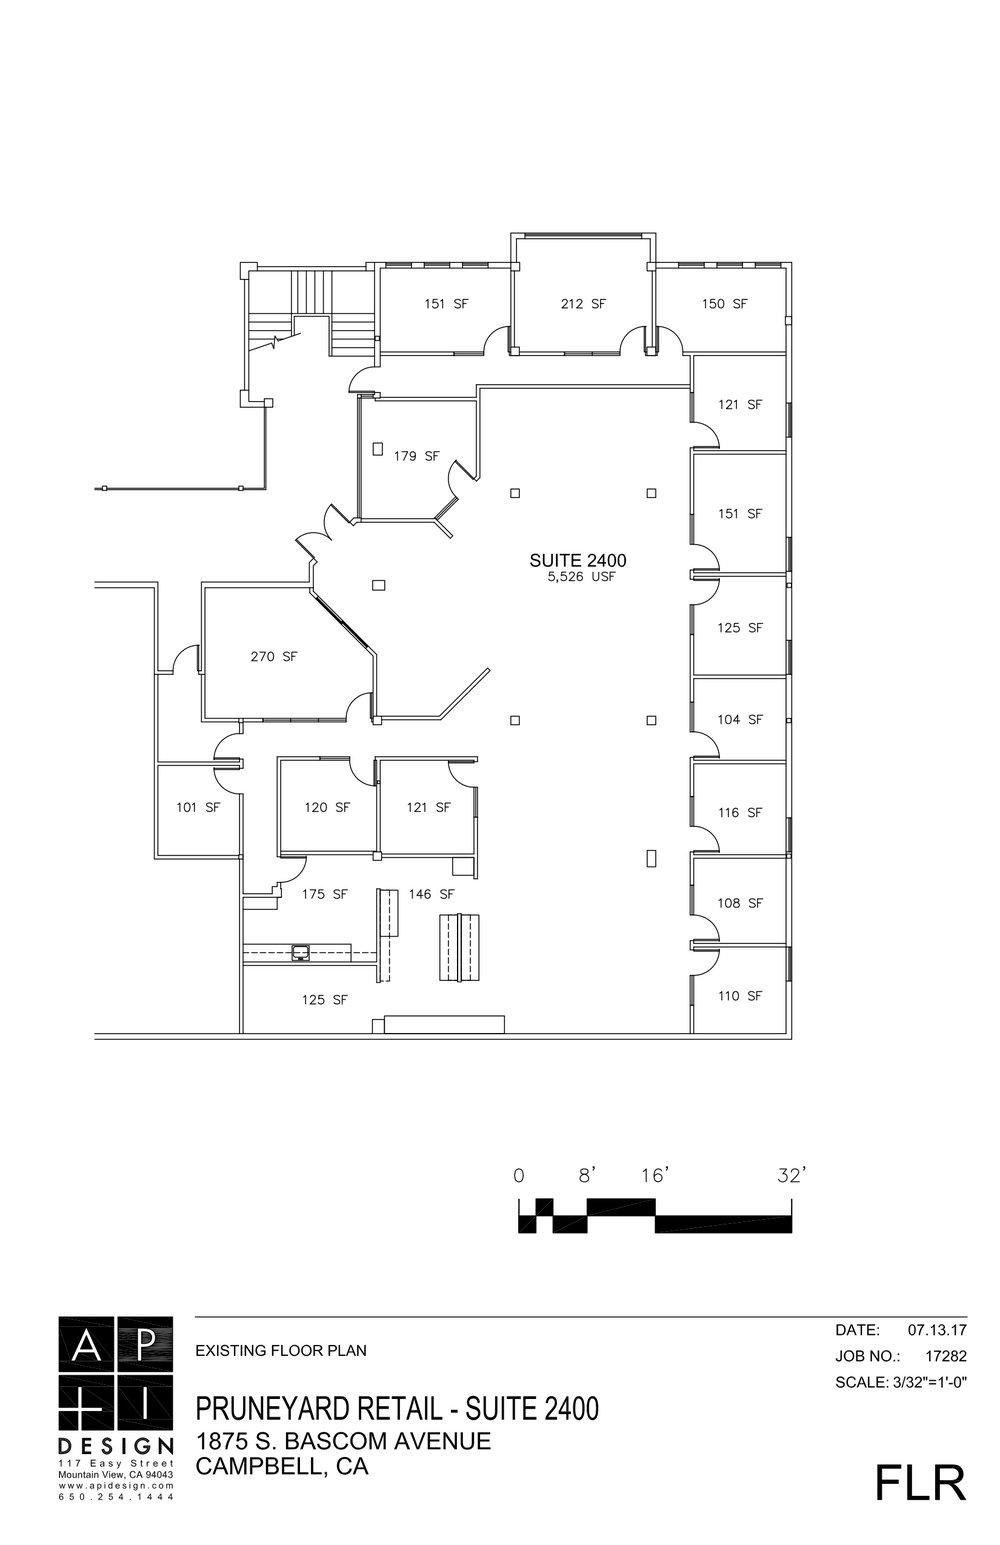 17282-SUITE 2400-FLR-11x17_071317 copy 2.jpg